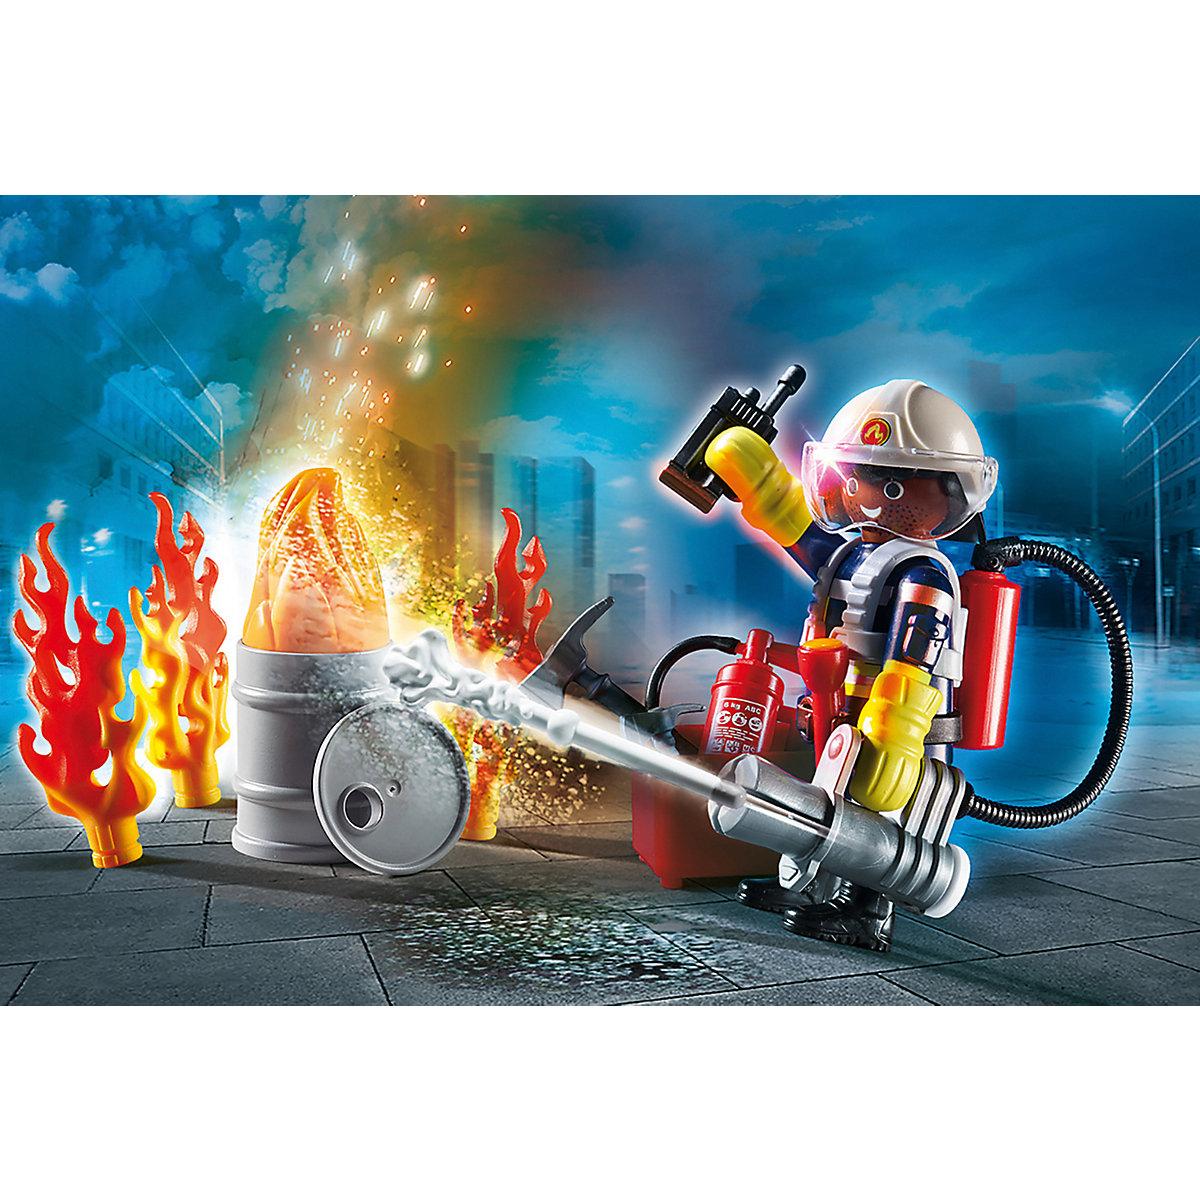 "PLAYMOBIL® 70291 Geschenkset ""Feuerwehr"" PLAYMOBIL City Action hGiNp"